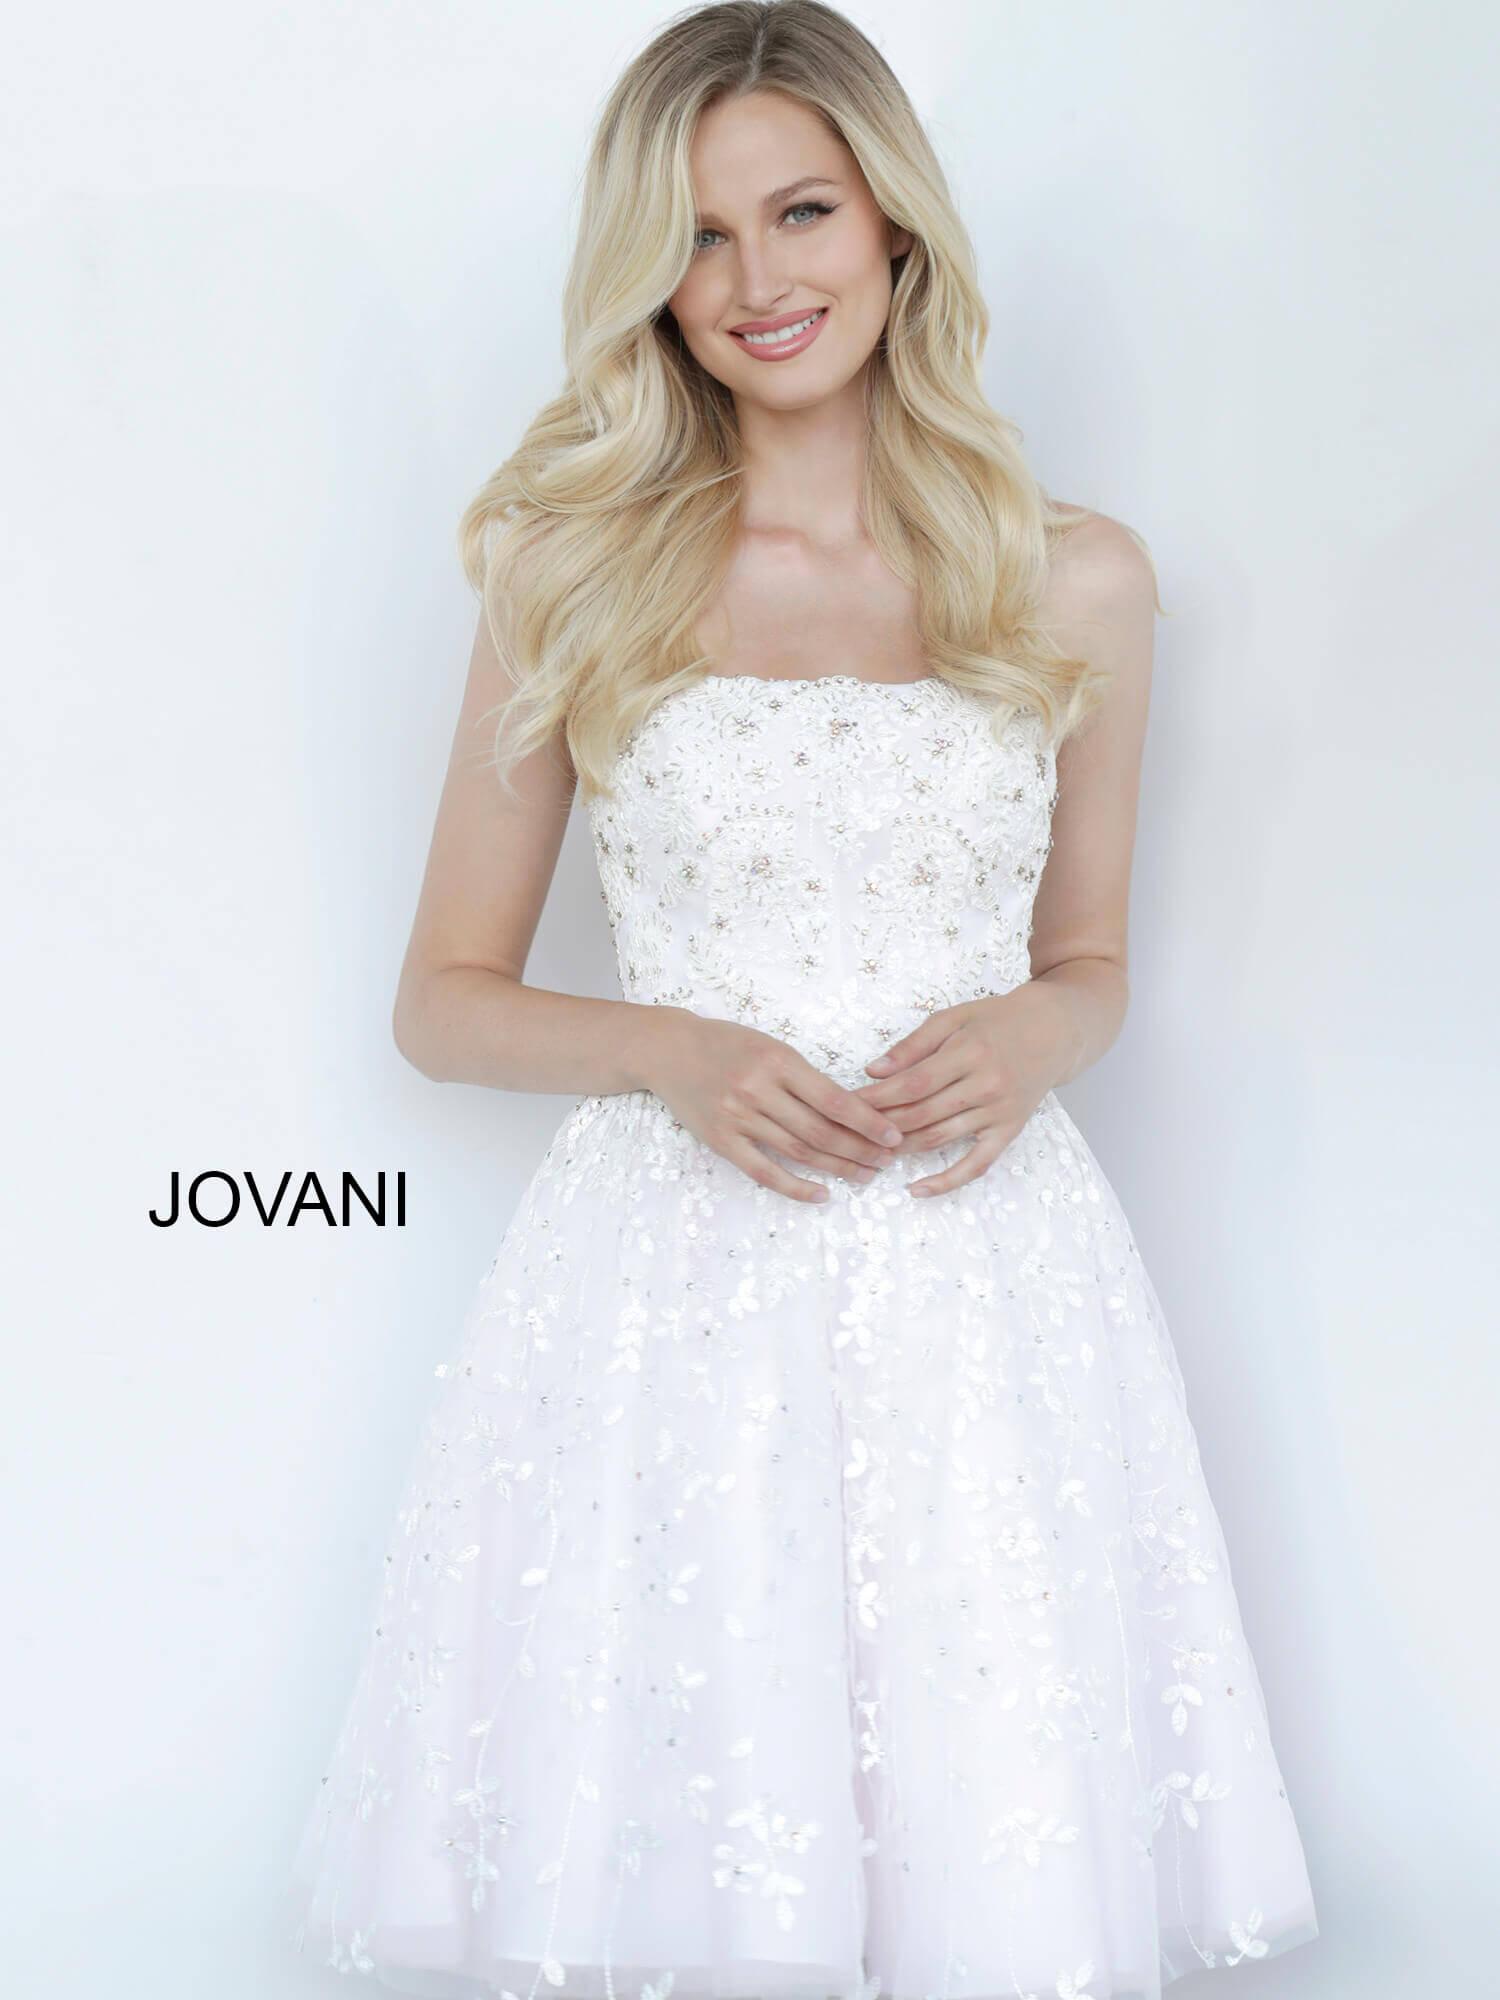 Jovani Short Wedding Dresses